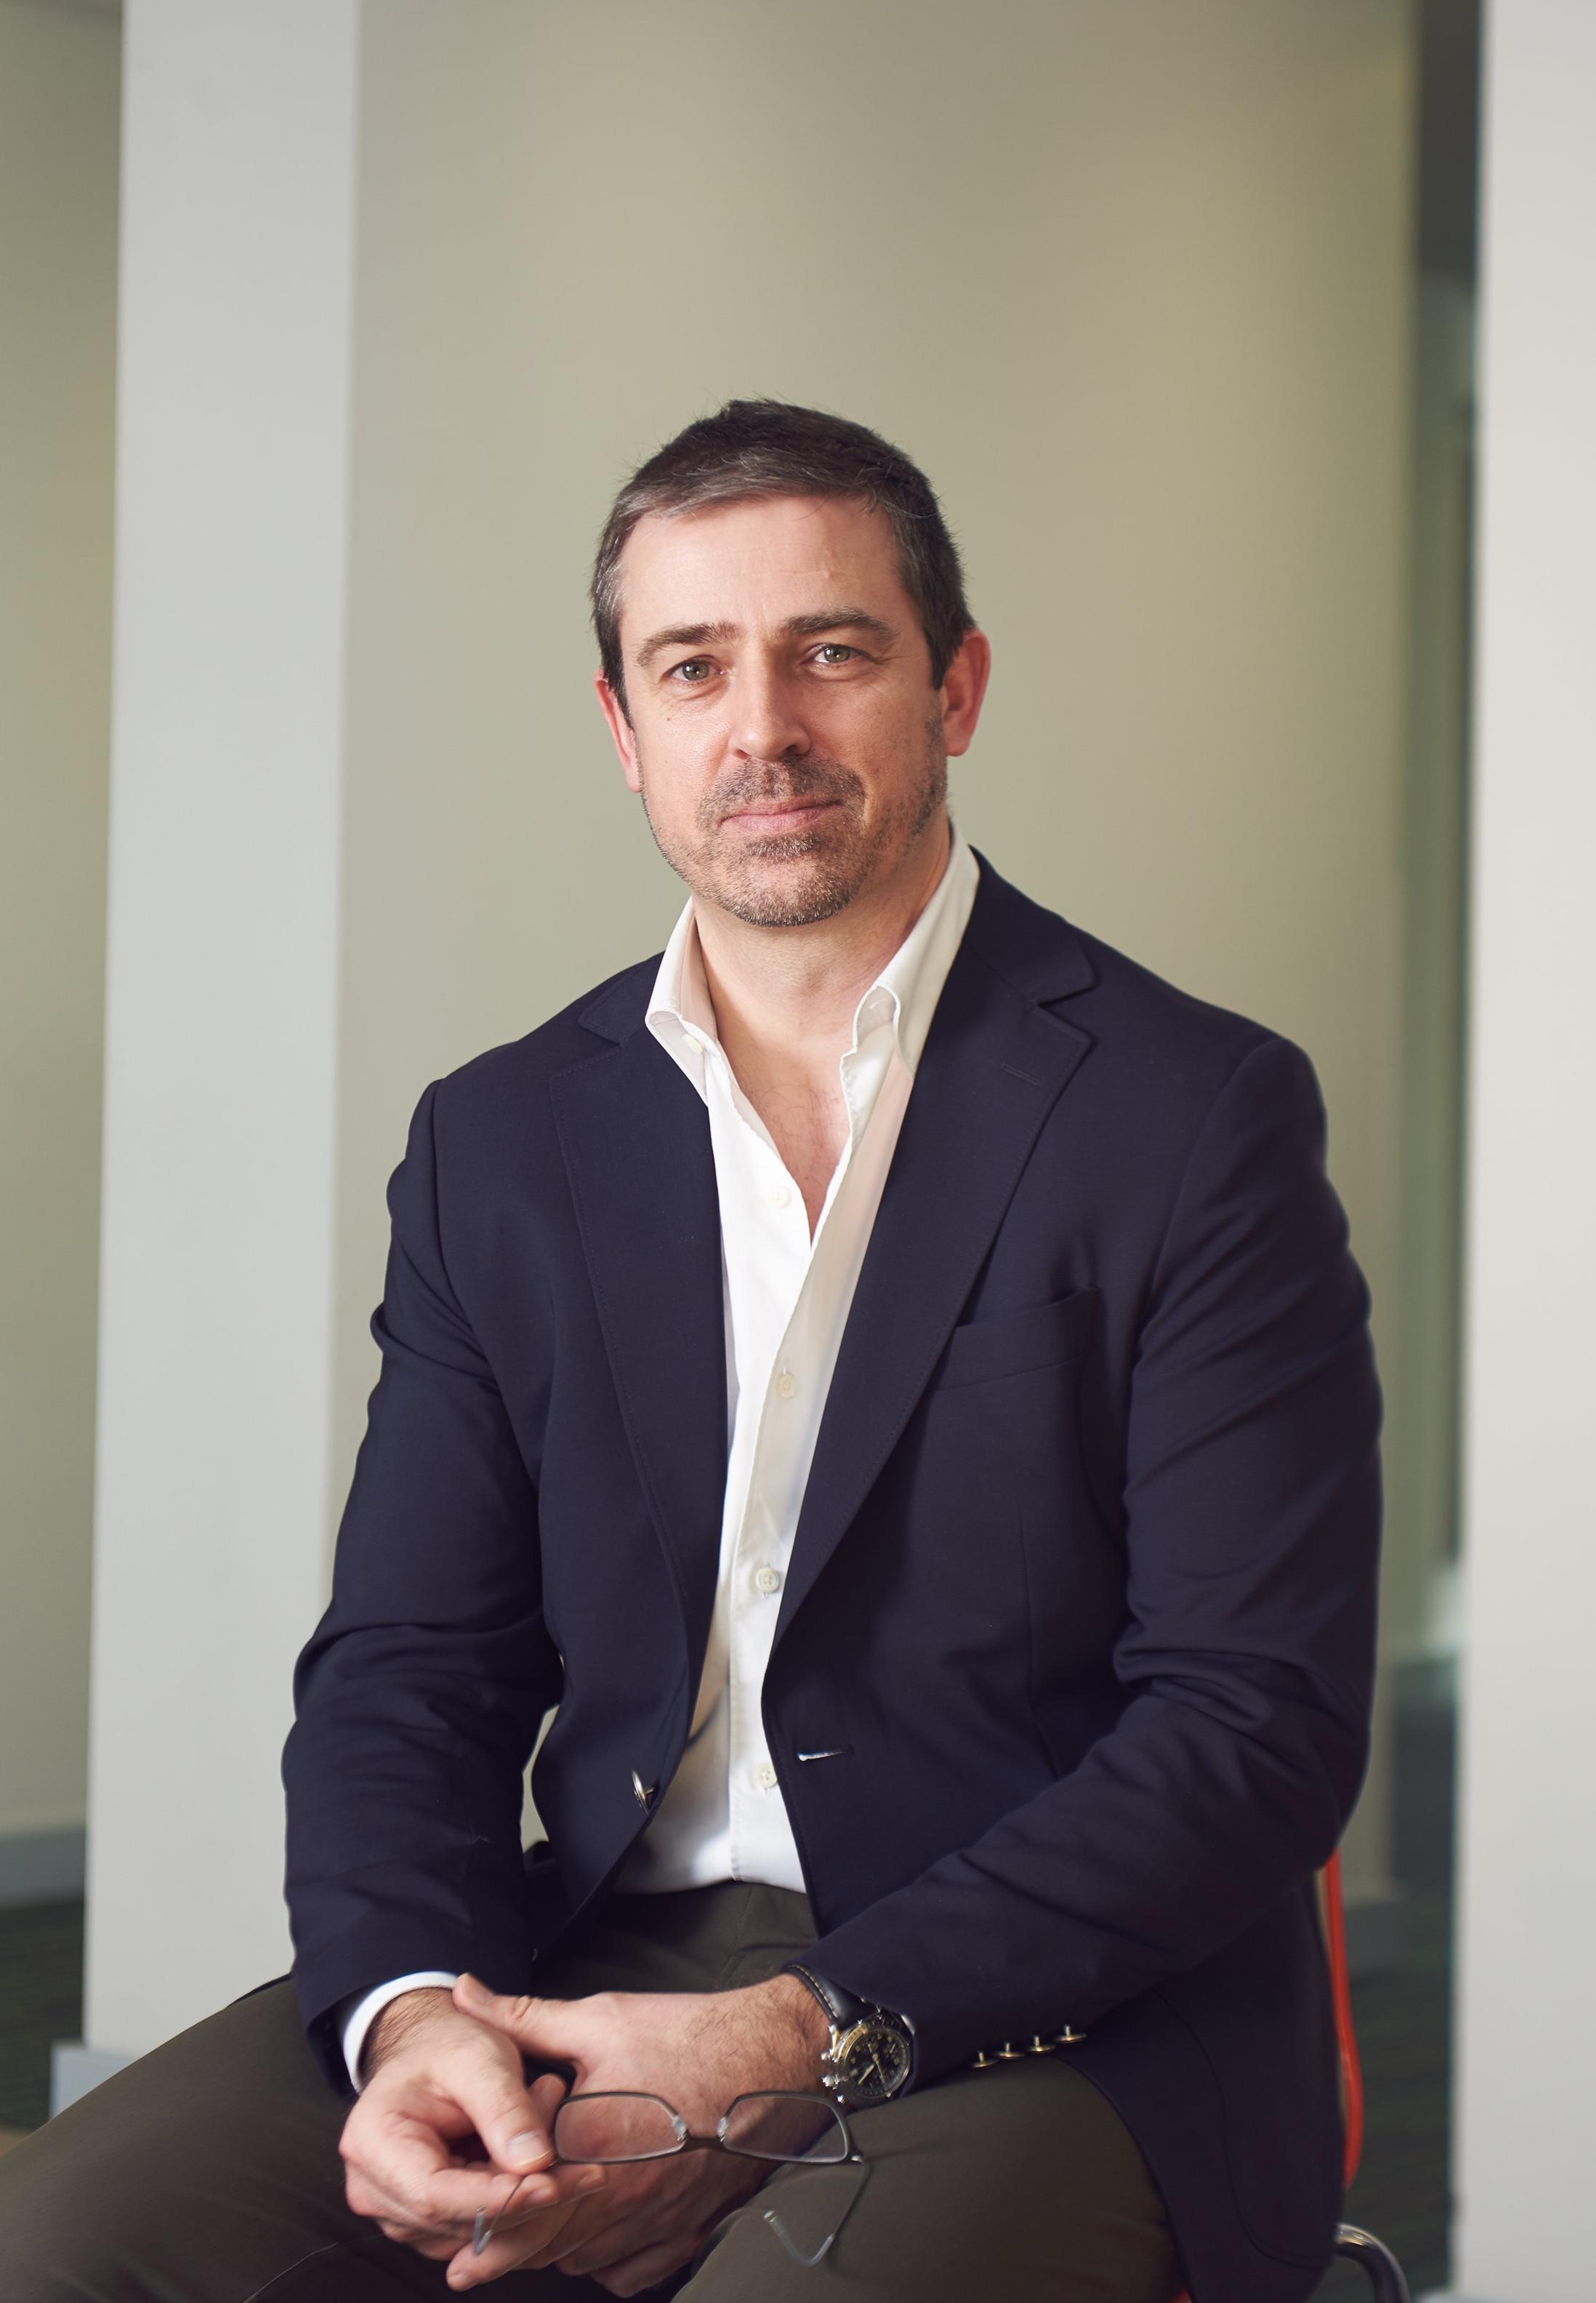 Nicholas Simmons CFO / Co-Founder